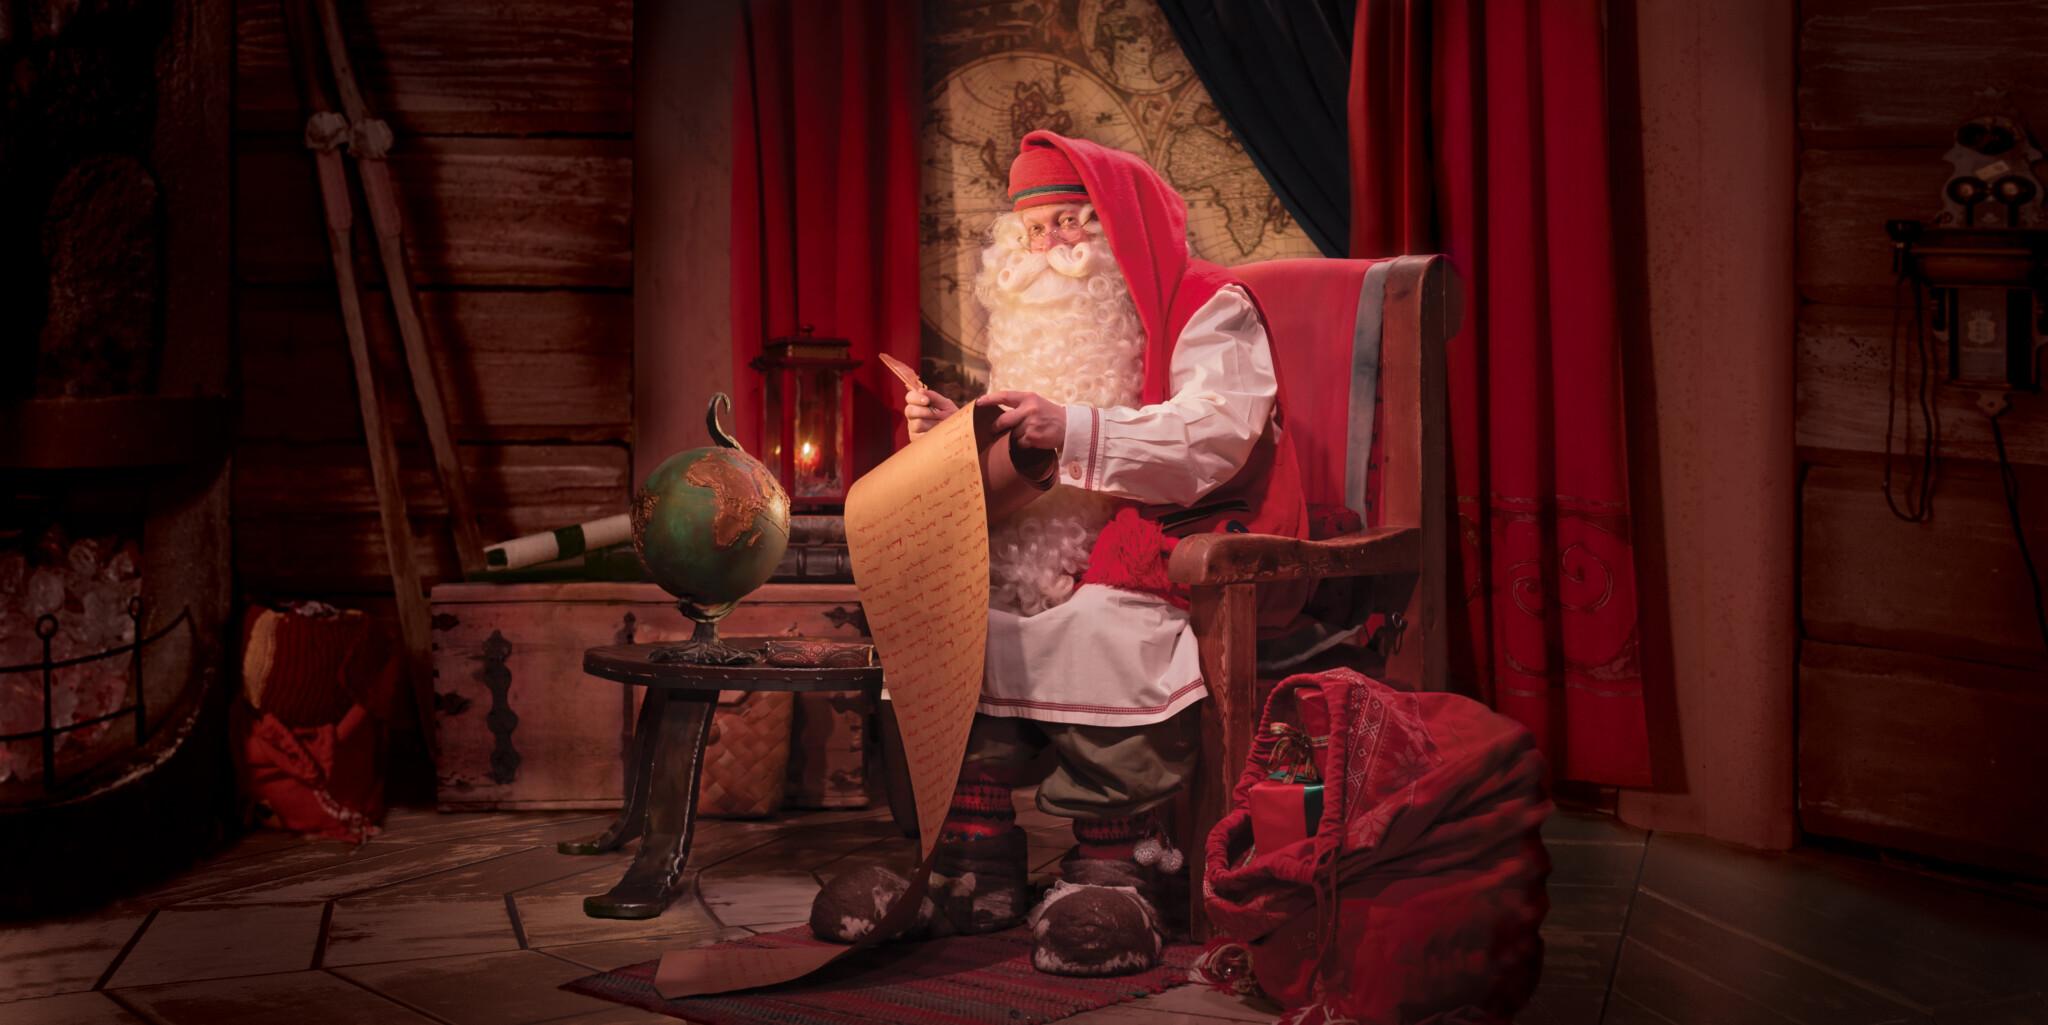 Joulupukin Kammari videopuhelu Joulupukille Jouluna 2020 Rovaniemi Lapland Finland